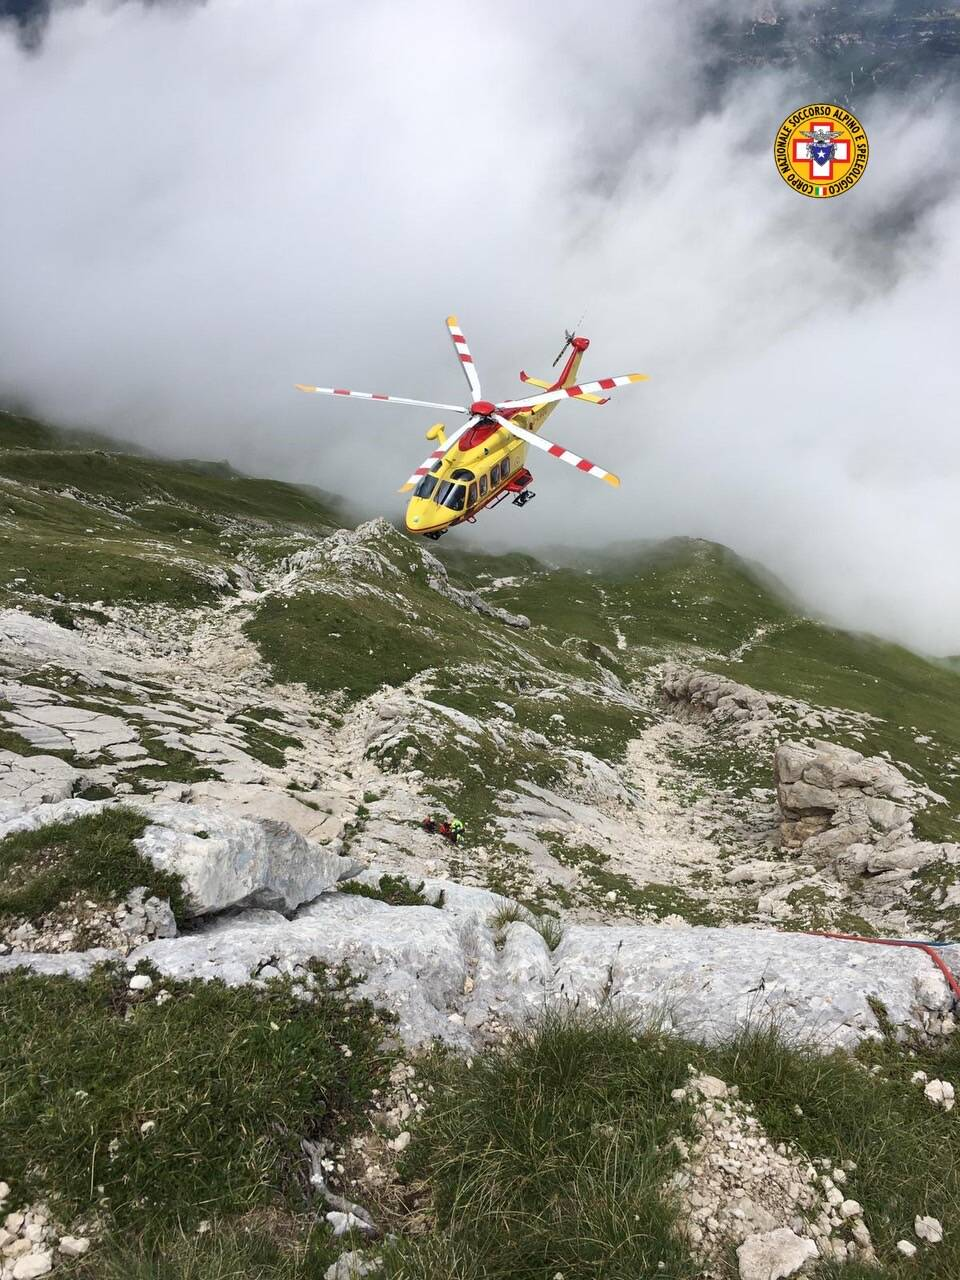 montagna incidenti gran sasso cnsas 118